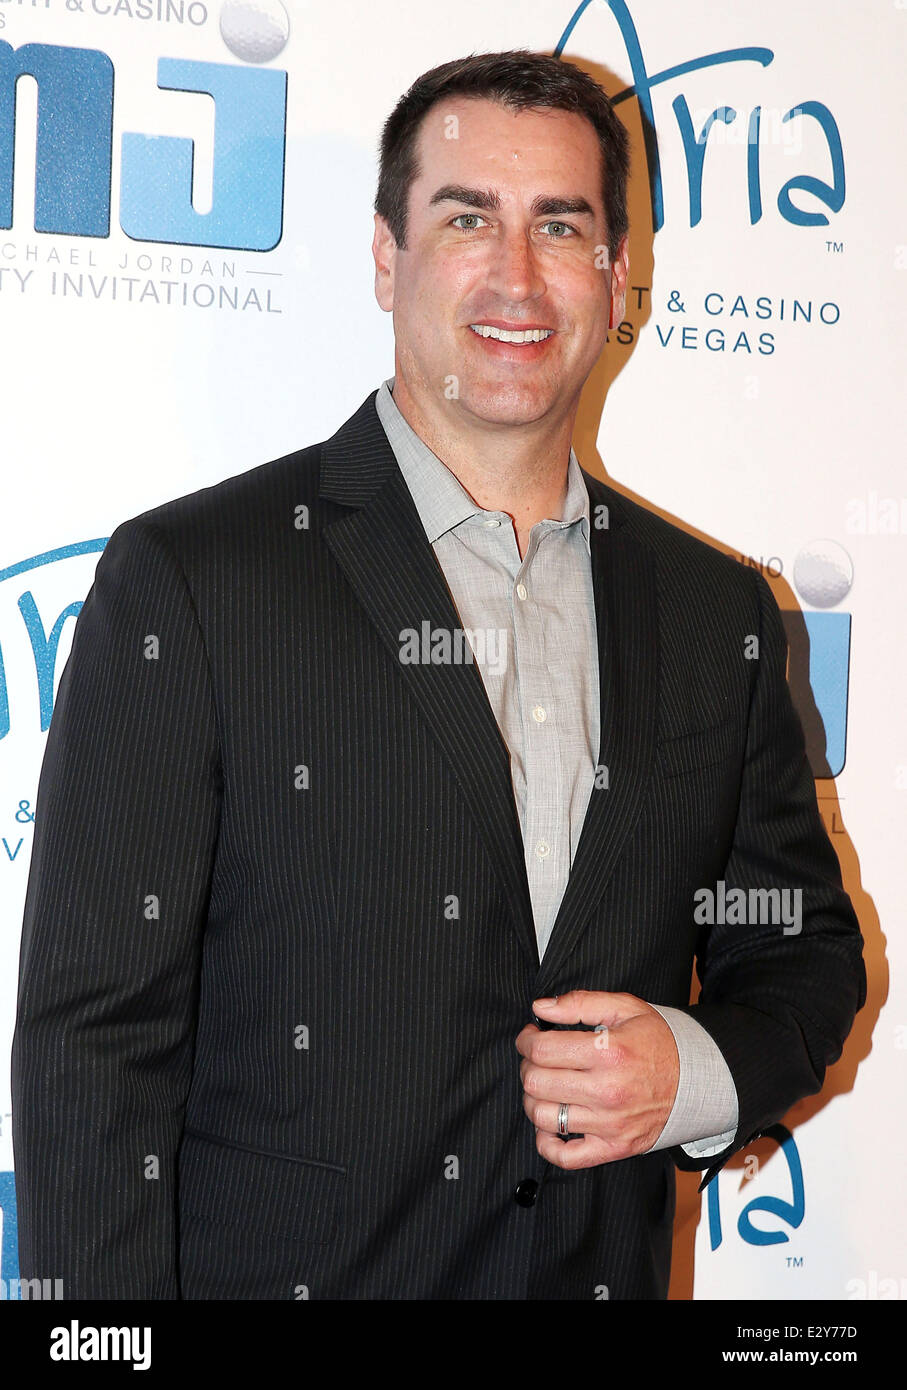 0796b8722d 12th Annual Michael Jordan Celebrity Invitational Gala at Aria Resort and  Casino Featuring: Rob Riggle Where: Las Vegas, Nevada, United States When:  05 Apr ...